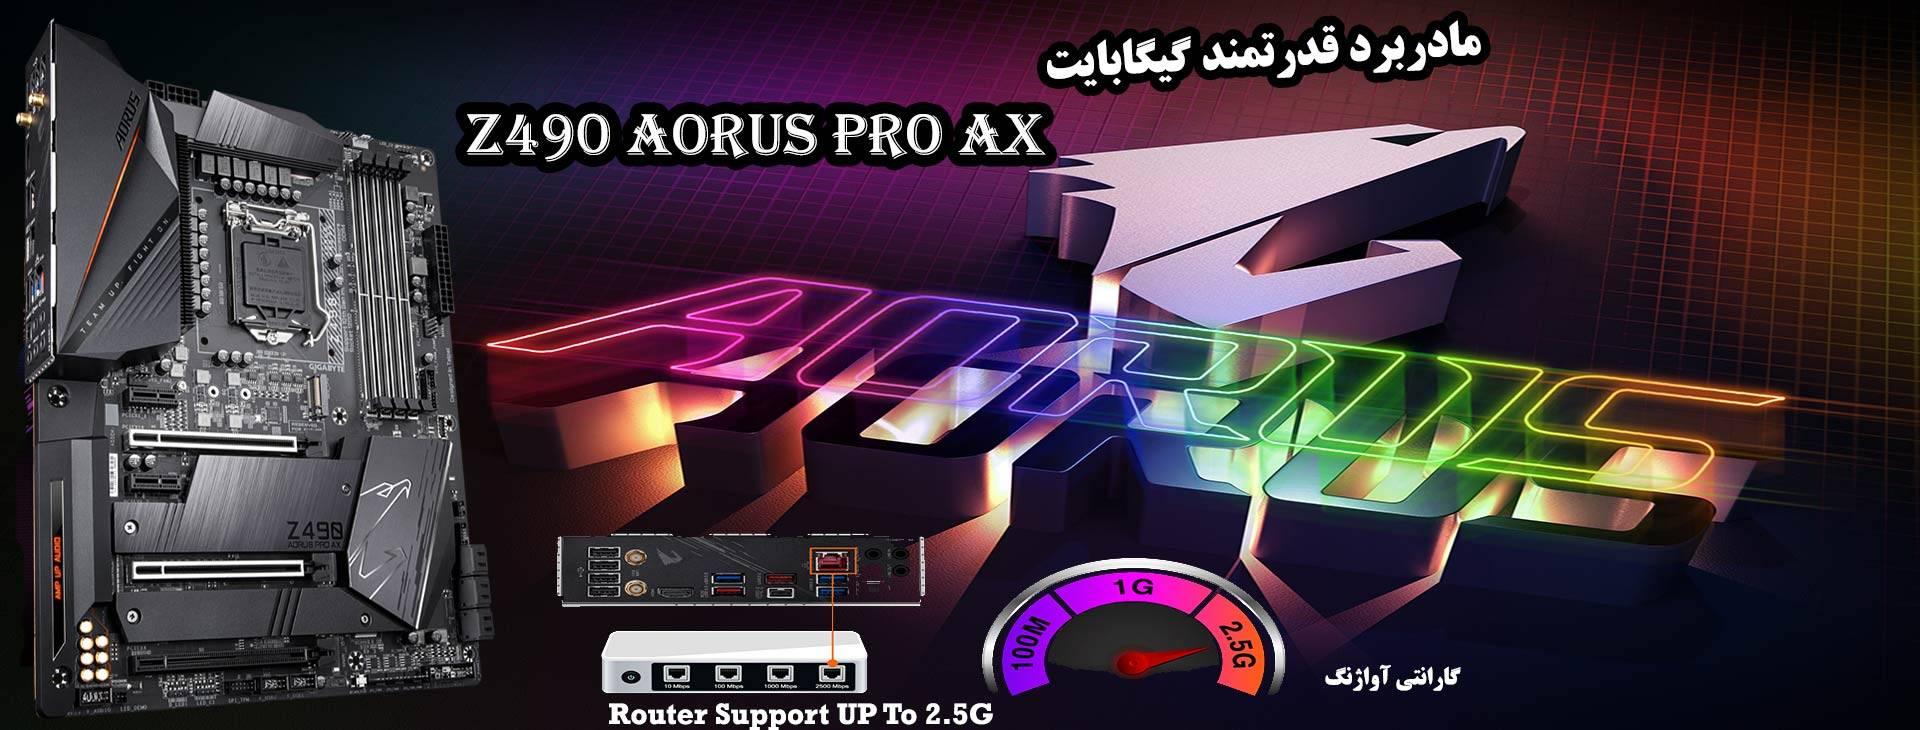 z490-aorus-pro-ax